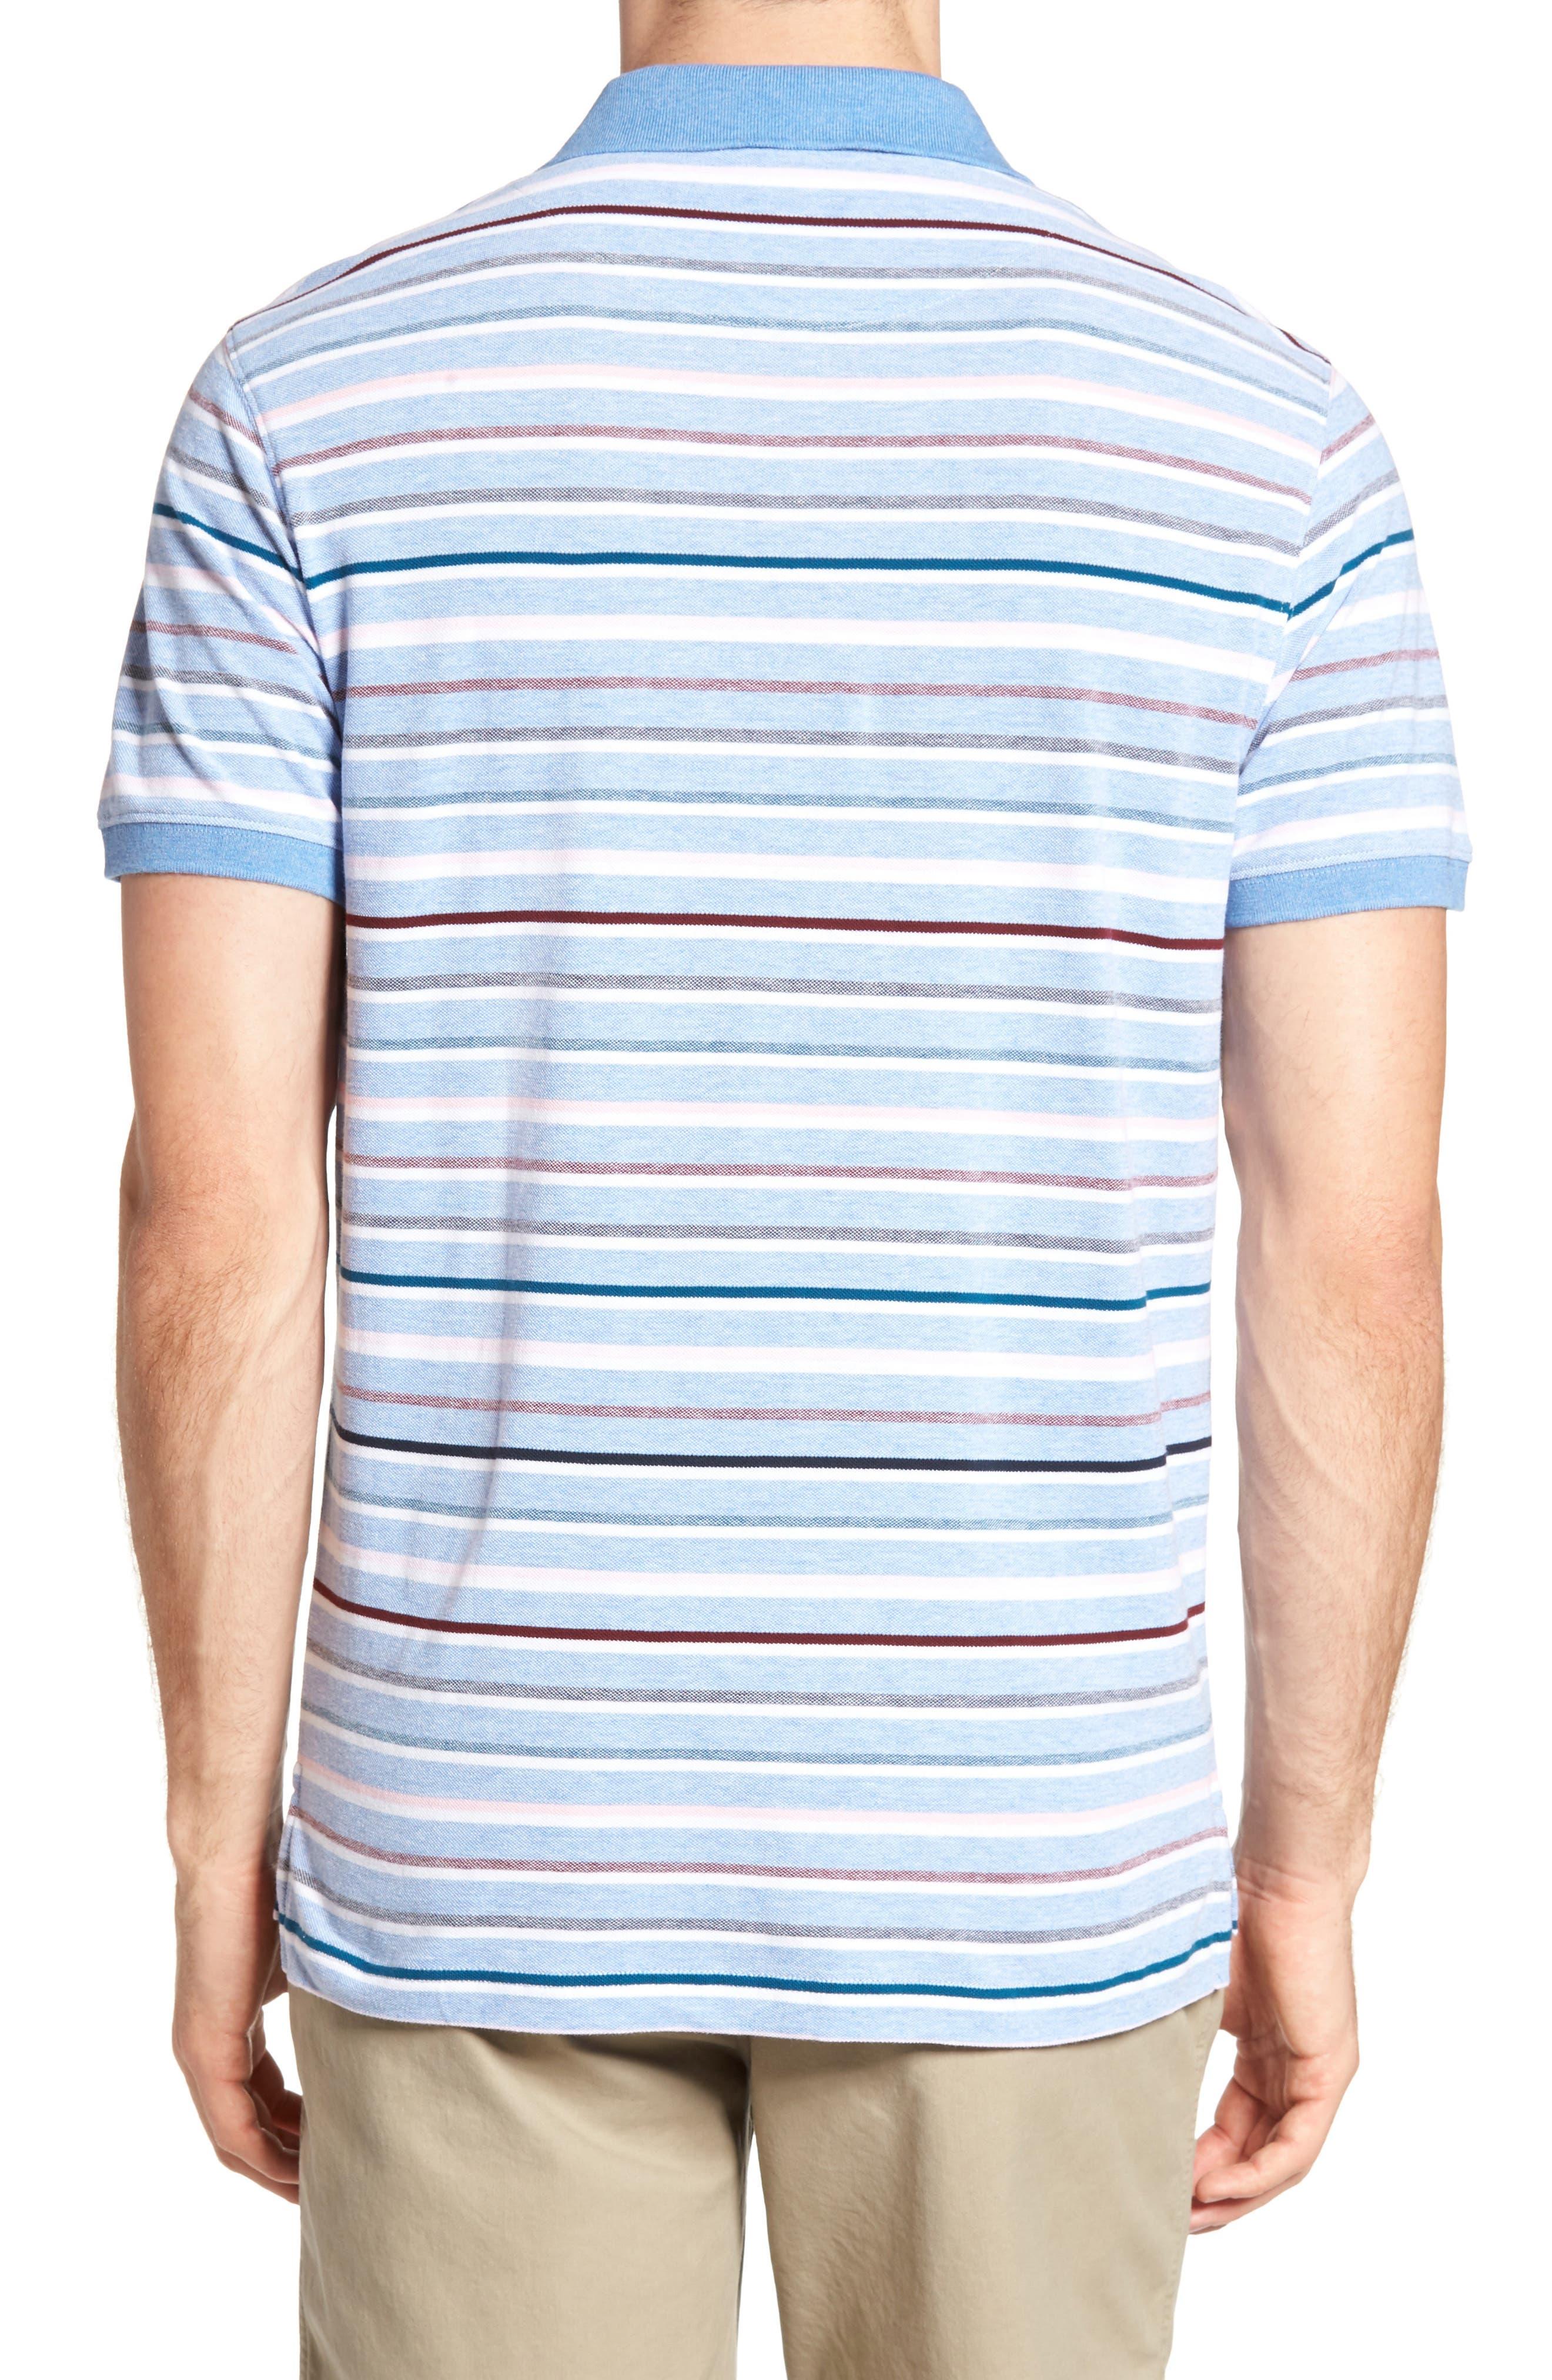 Gowan Hill Sports Fit Cotton Polo,                             Alternate thumbnail 2, color,                             Stonewash